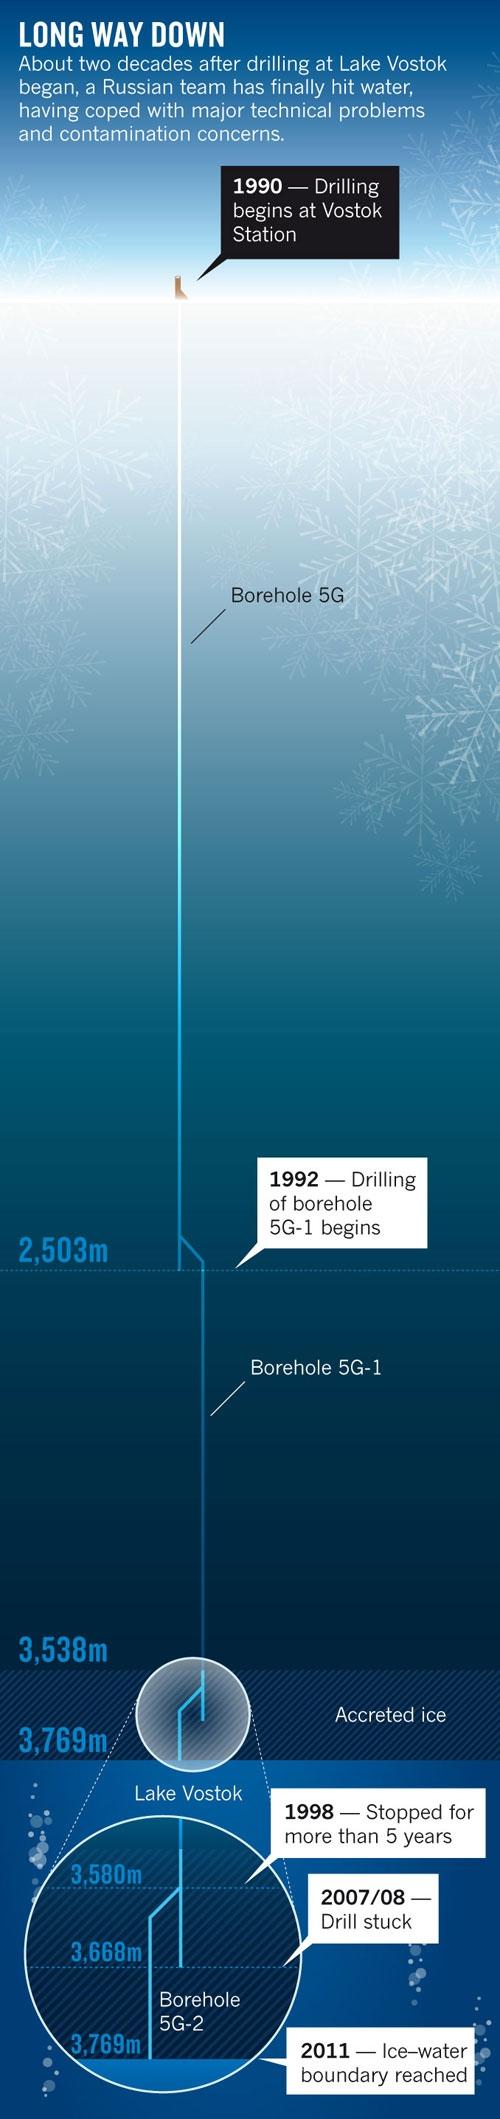 vostok_drilling2.jpg